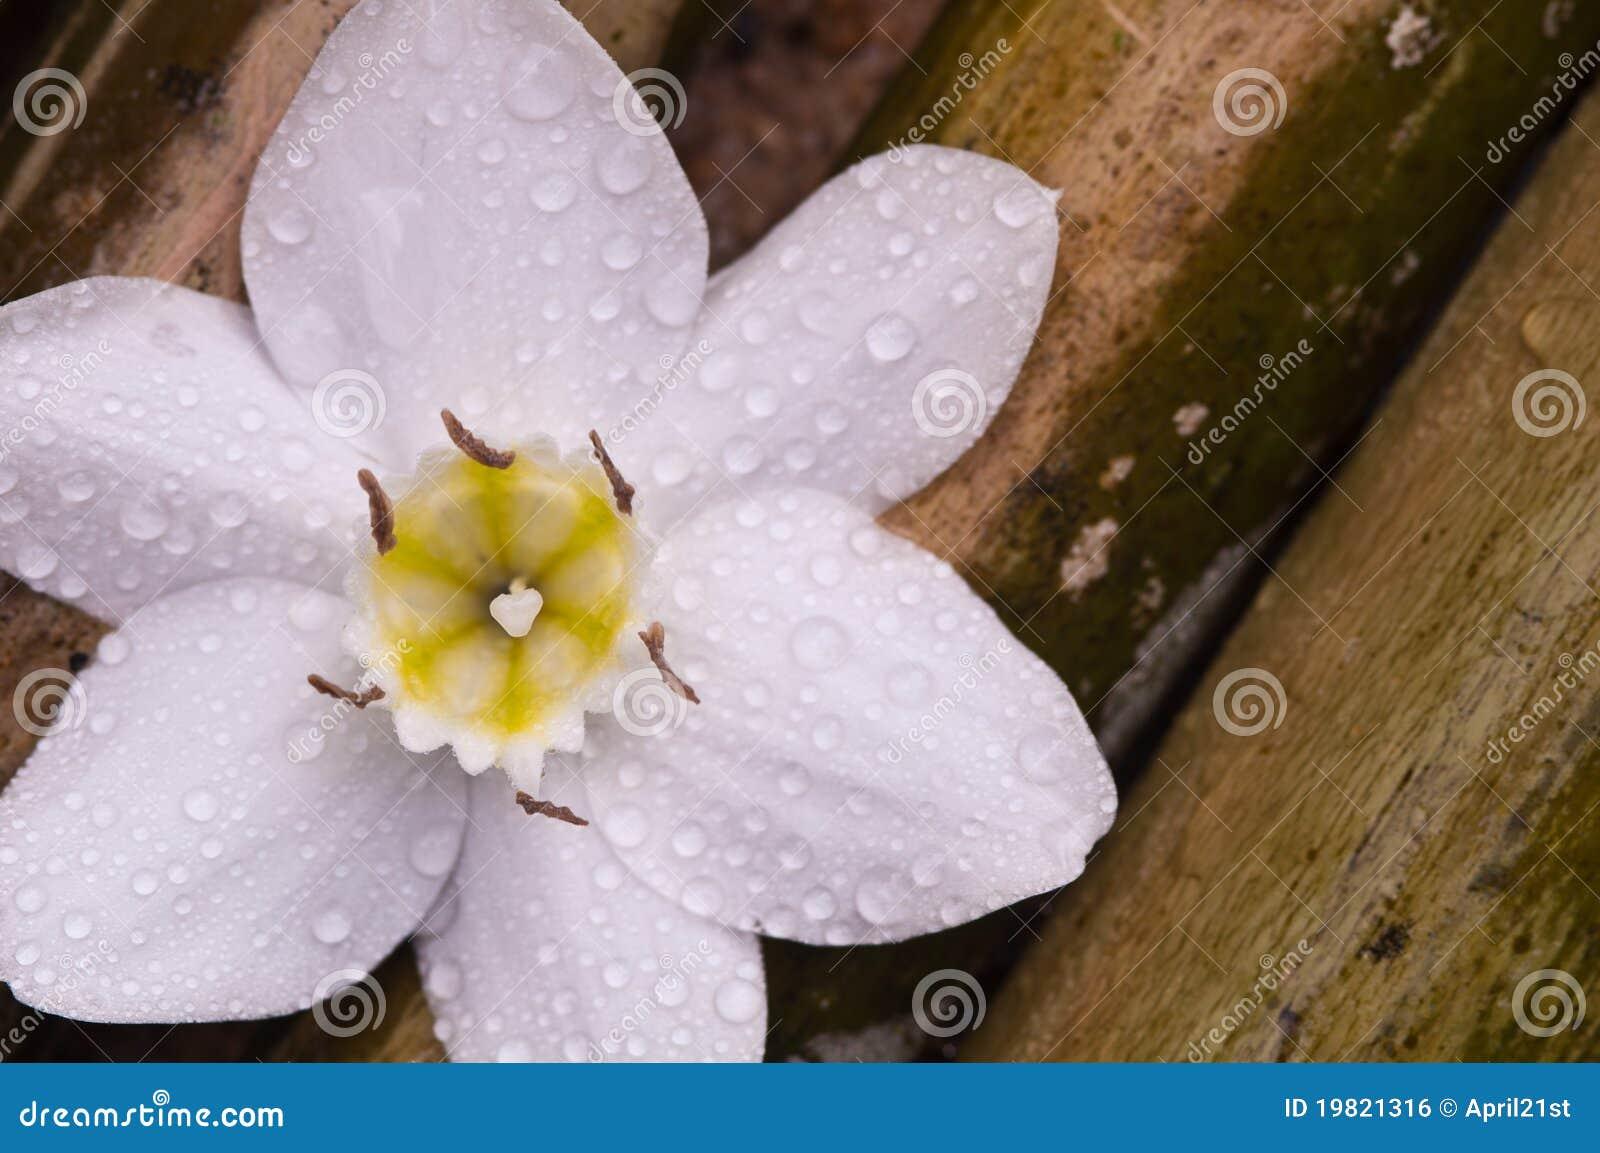 Amazon Lily White Flower On Bamboo Wood Stock Photo Image Of Card